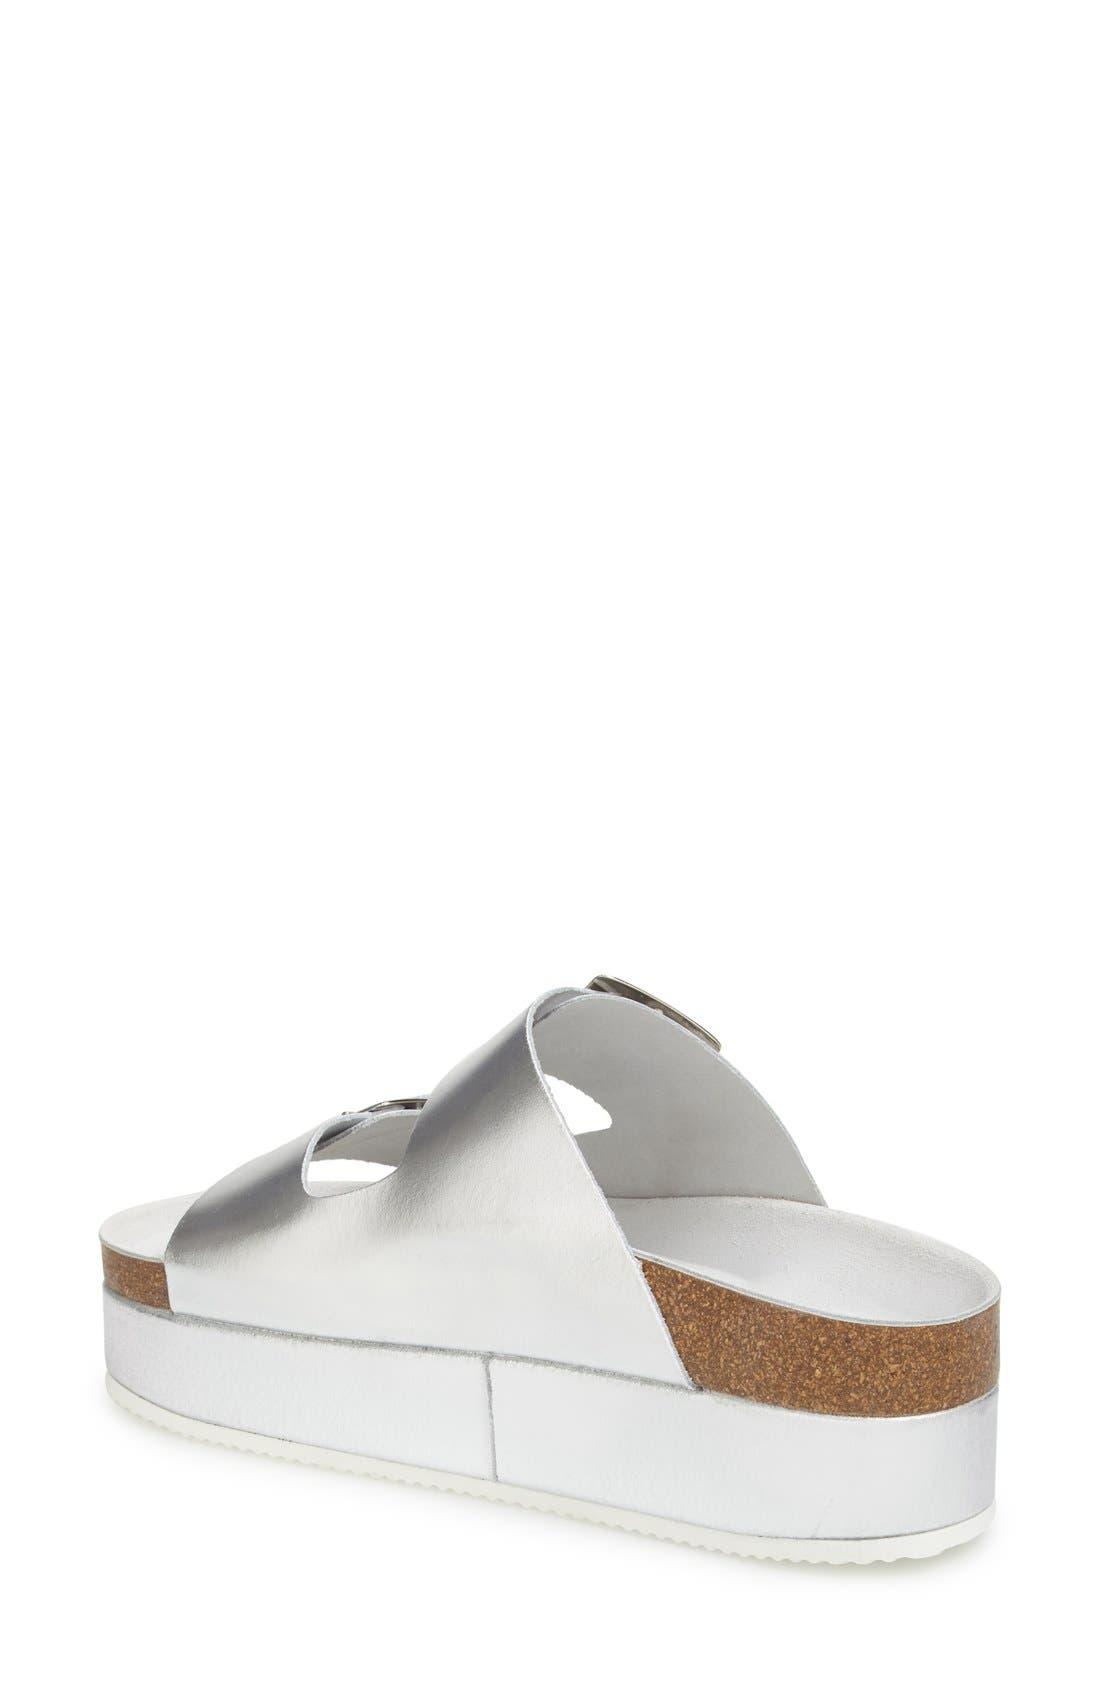 Alternate Image 2  - Topshop 'Fang' Platform Sandal (Women)